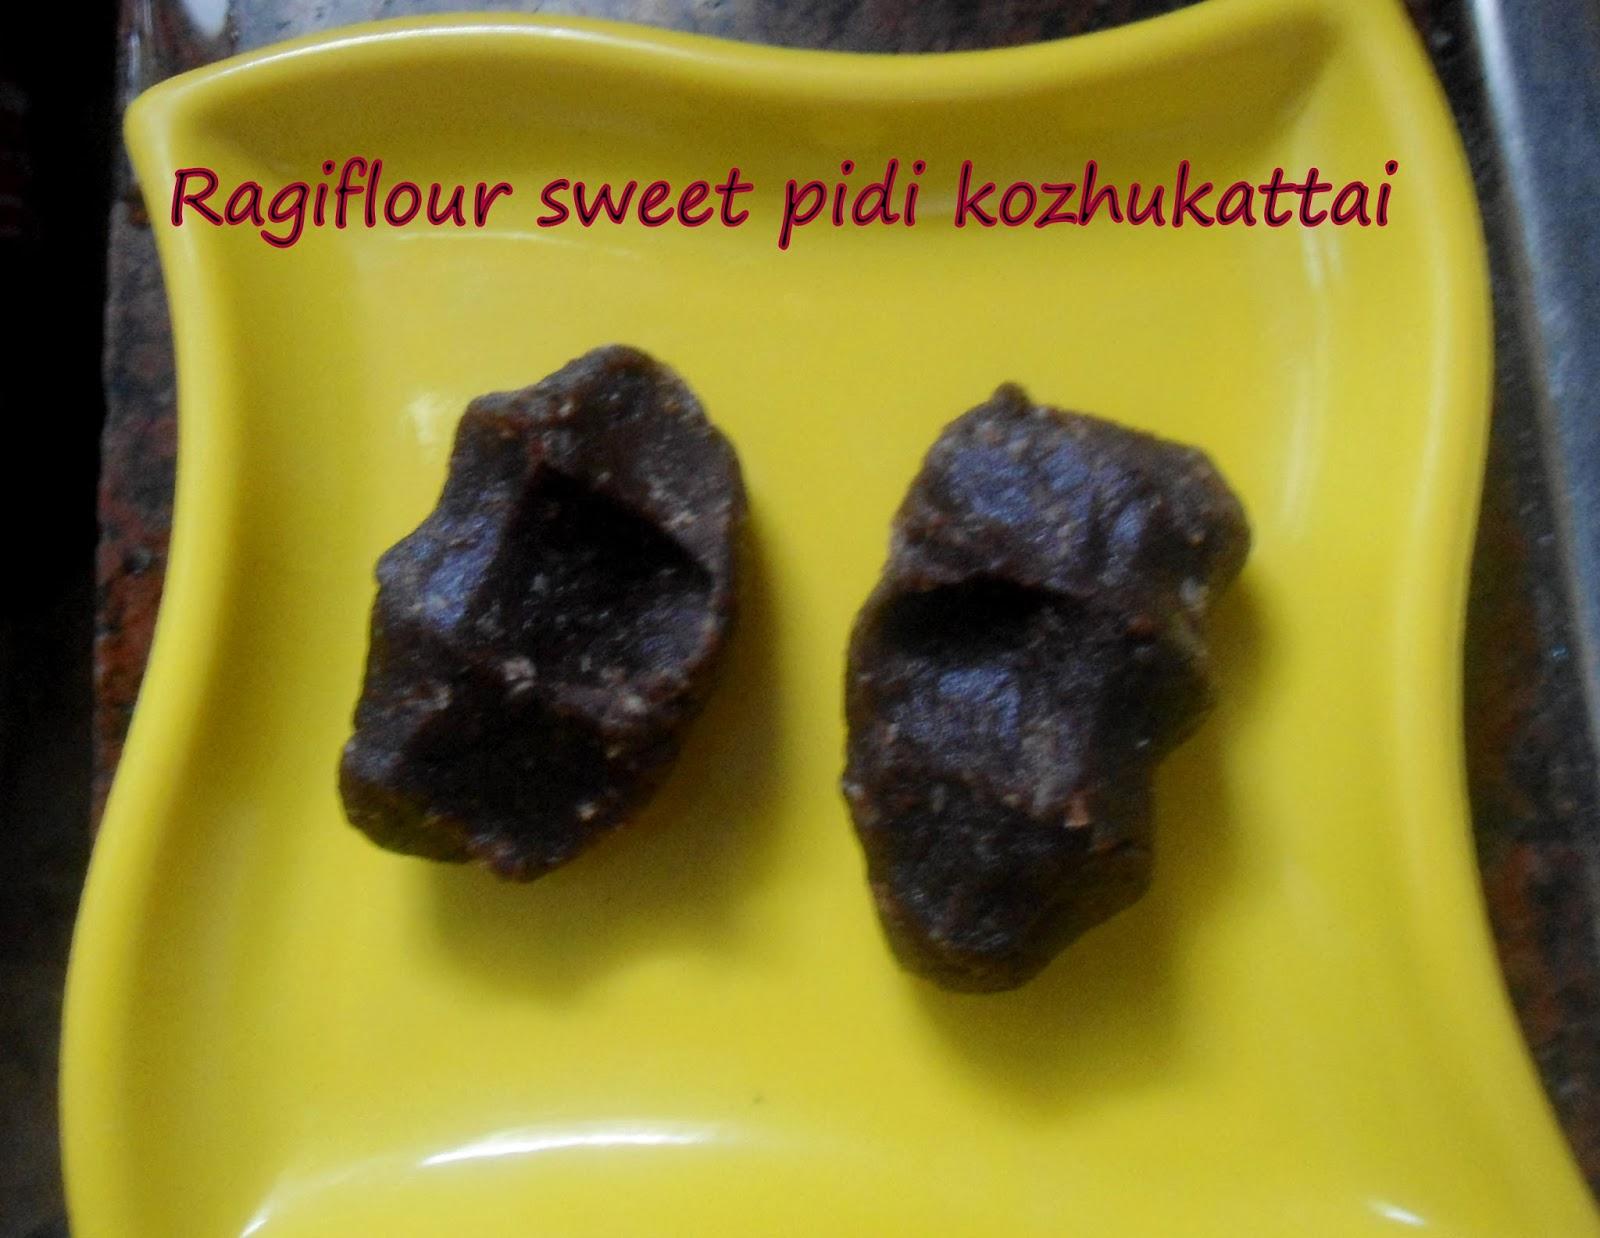 Ragi flour pidi kozhukattai(sweet)